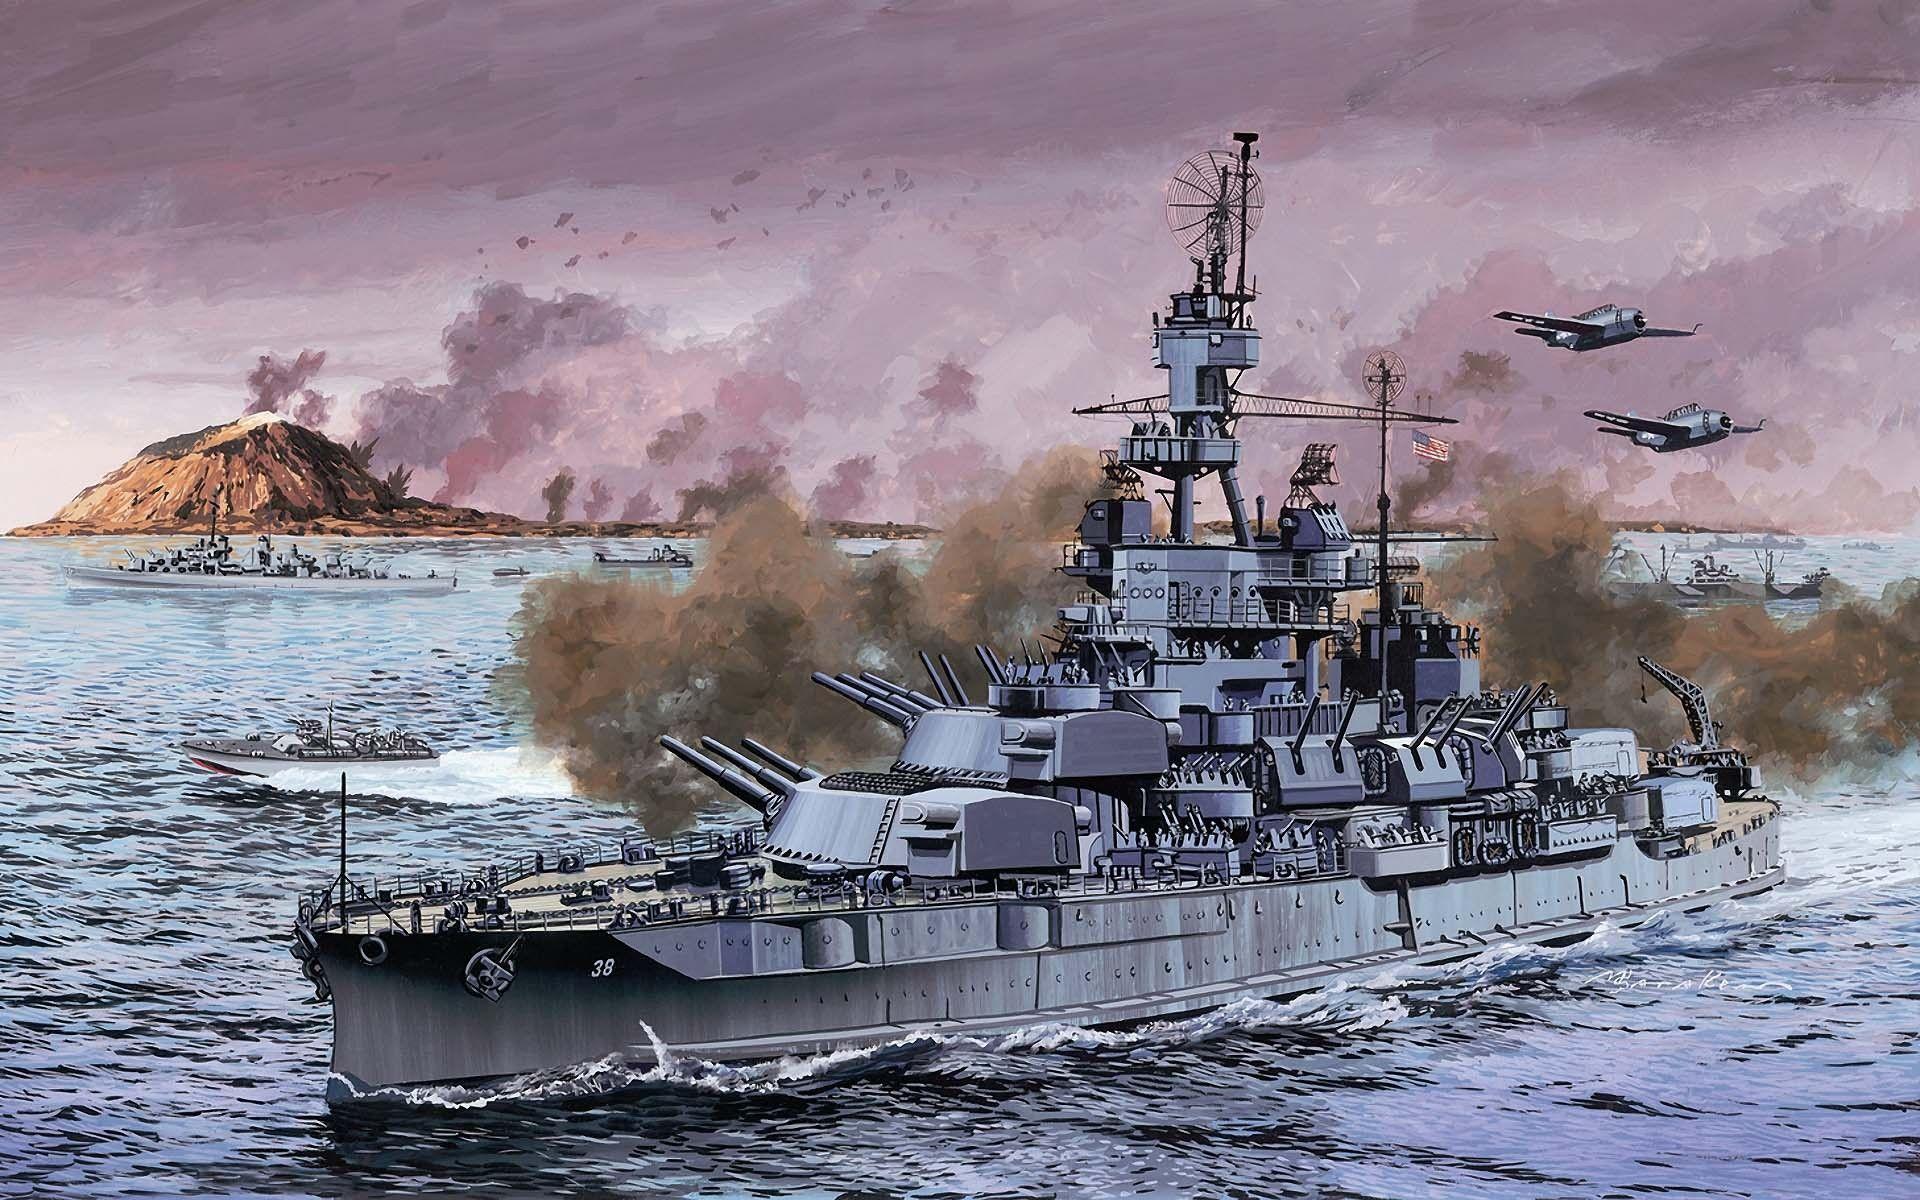 navy wallpaper 1440x900 ships - photo #25